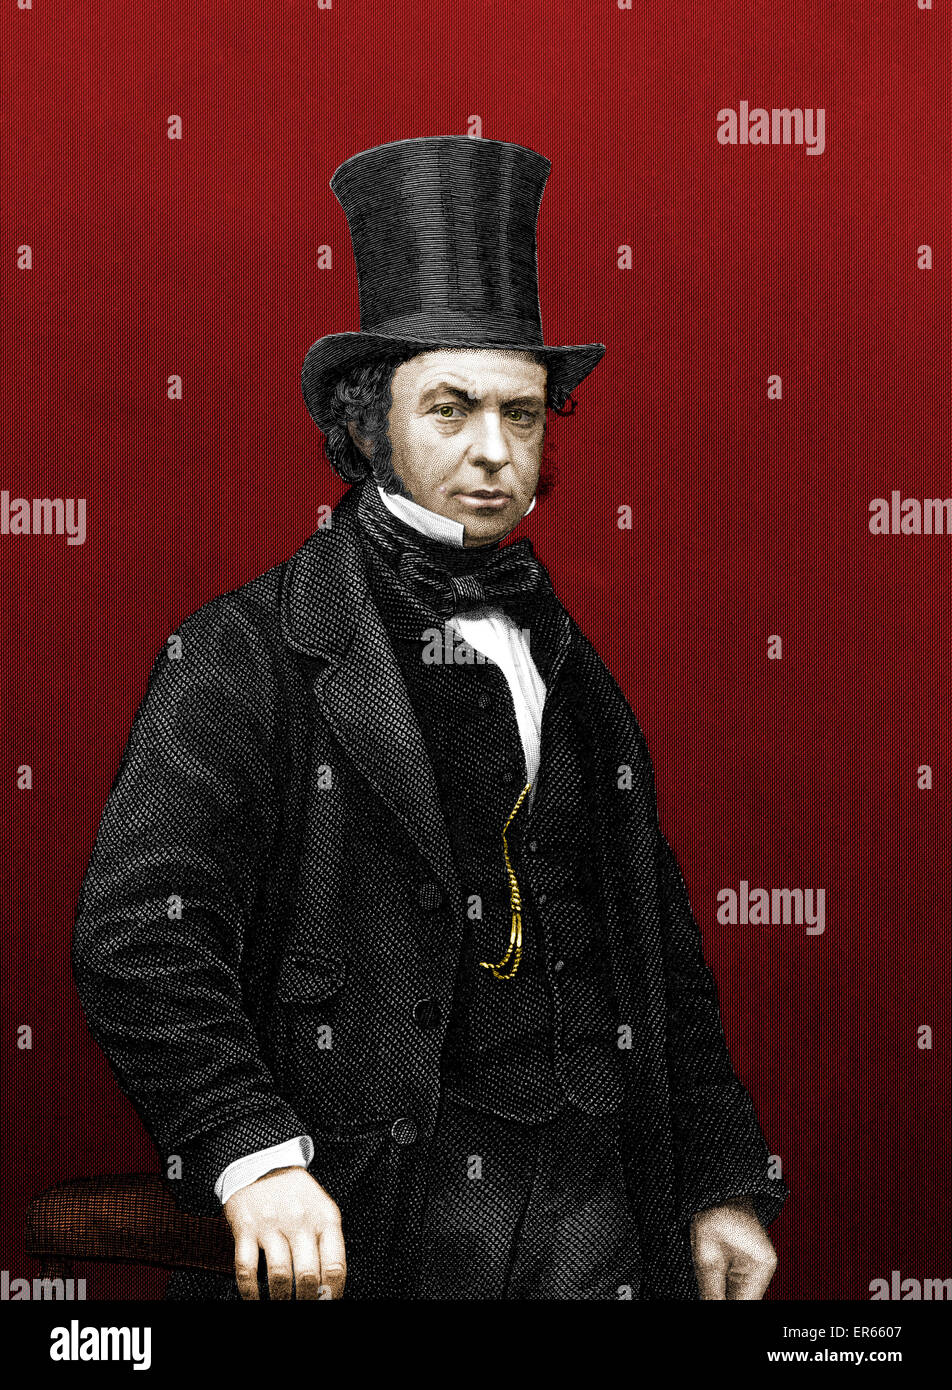 Isambard Kingdom Brunel (1806 15 September 1859) - English mechanical and civil engineer. Designer and builder of - Stock Image